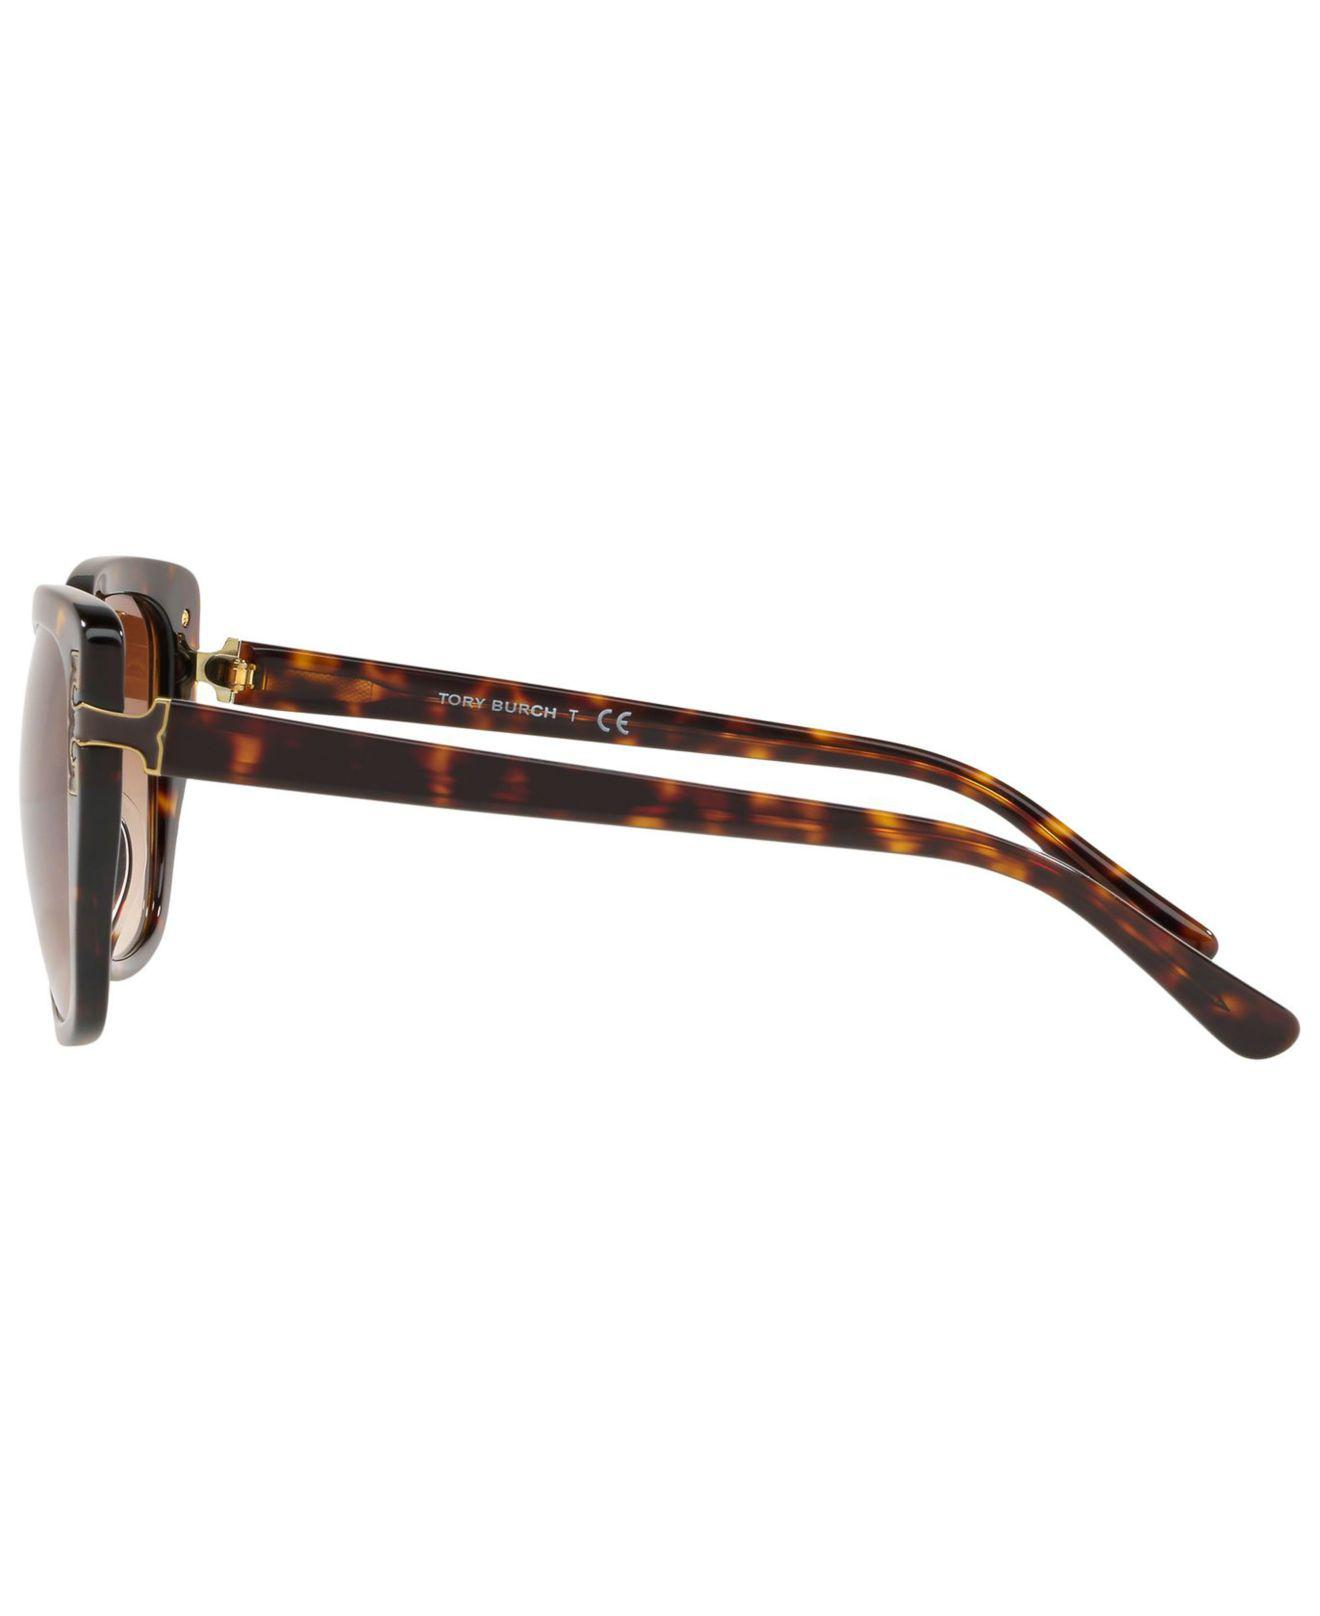 22686af772c0 Tory Burch - Brown Gradient Cat-eye Sunglasses - Lyst. View fullscreen